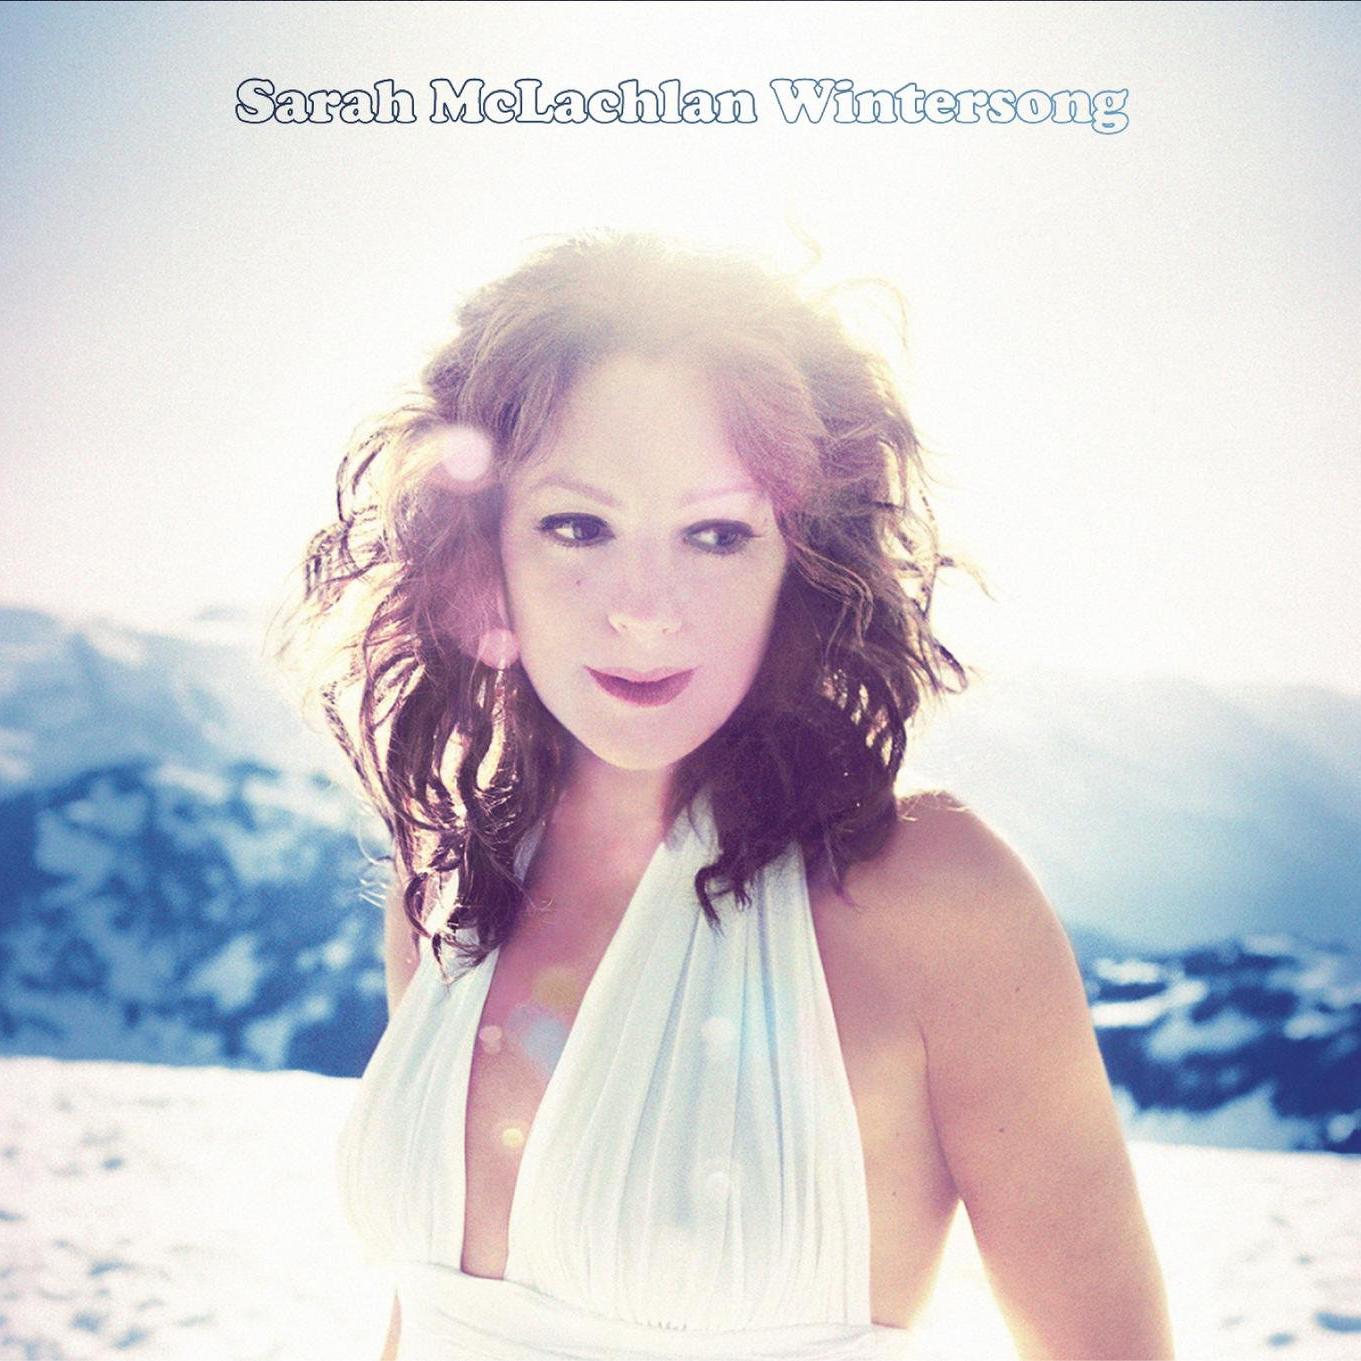 Sarah McLachlan, Wintersong